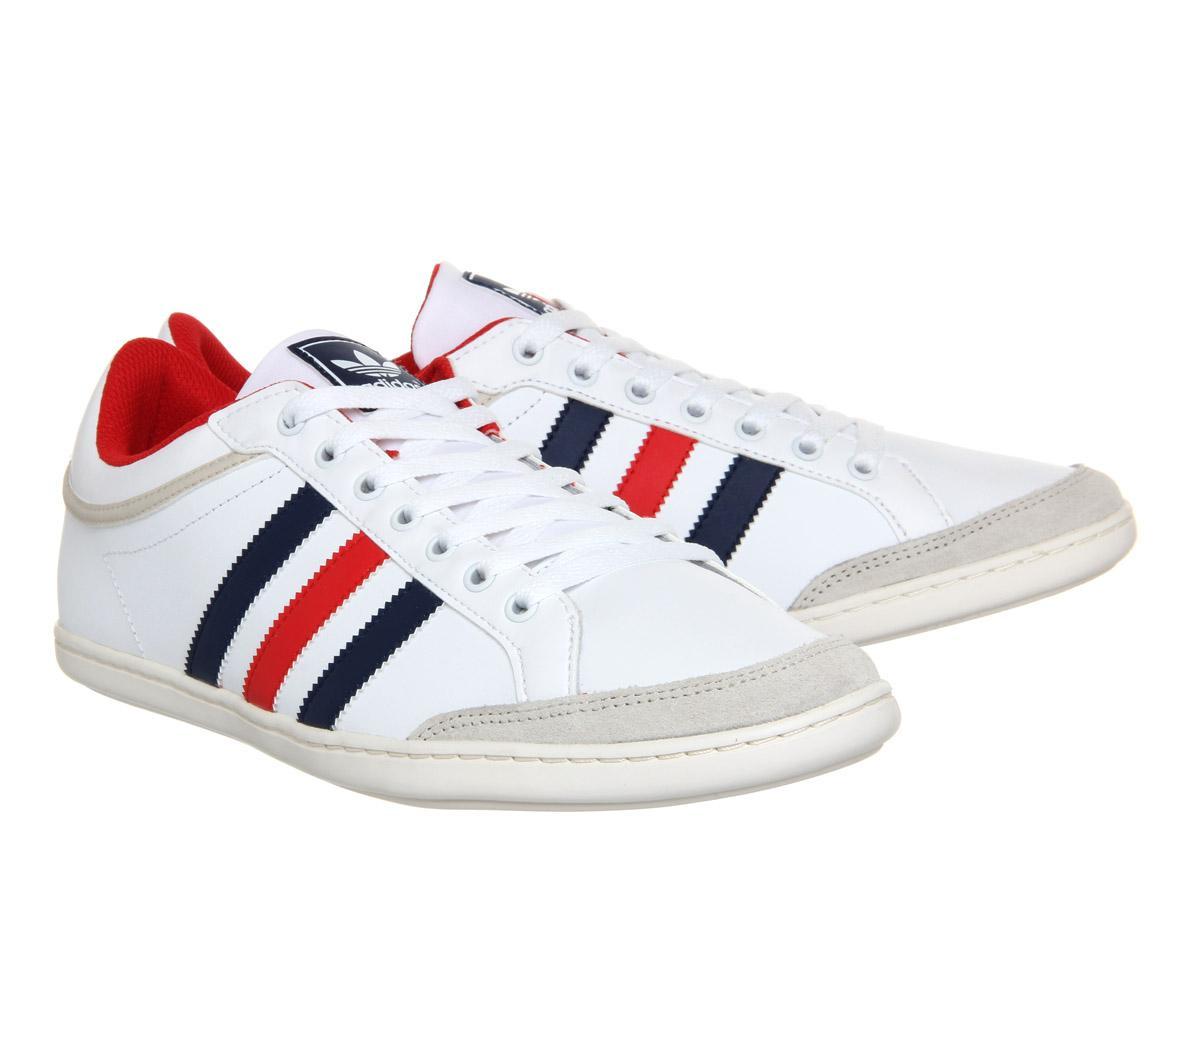 adidas Originals Plimcana Low in White for Men - Lyst